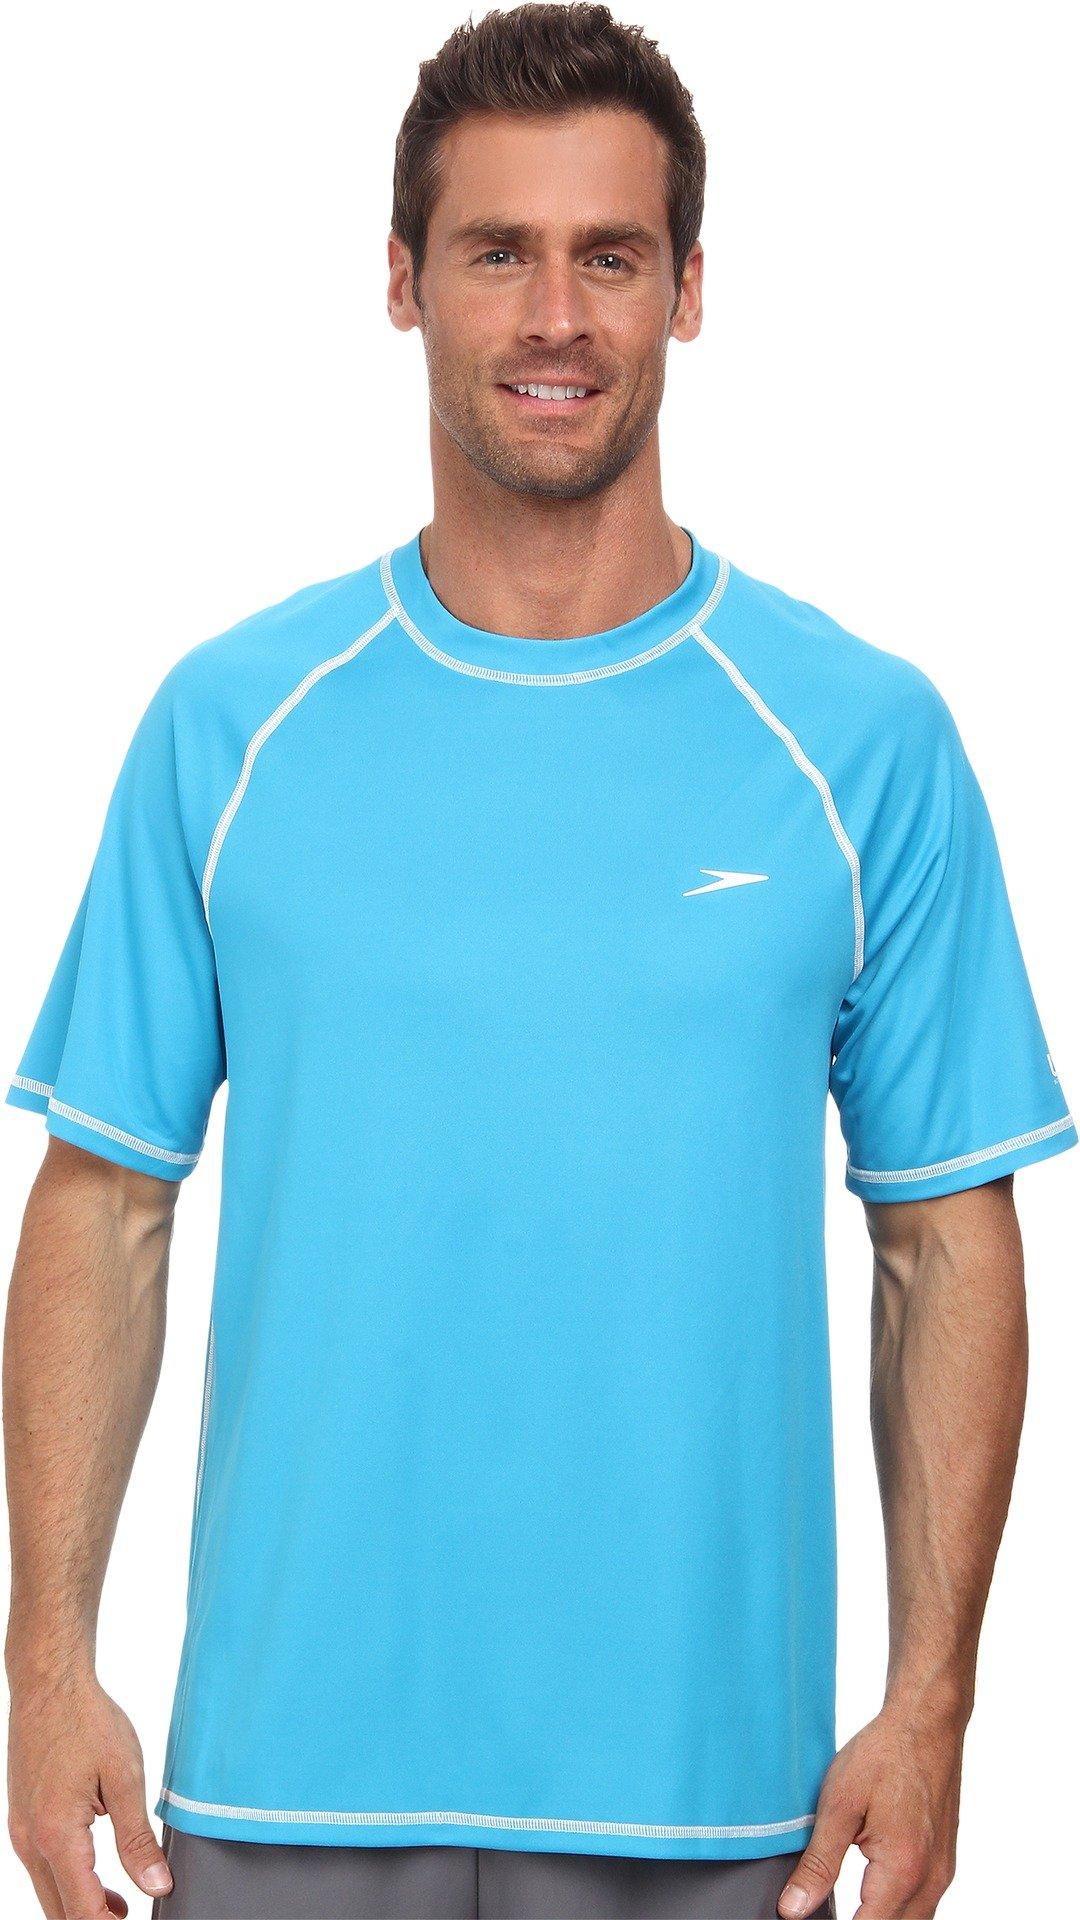 Speedo Men's UPF 50+ Easy Short Sleeve Rashguard Swim Tee, Cyan, Large